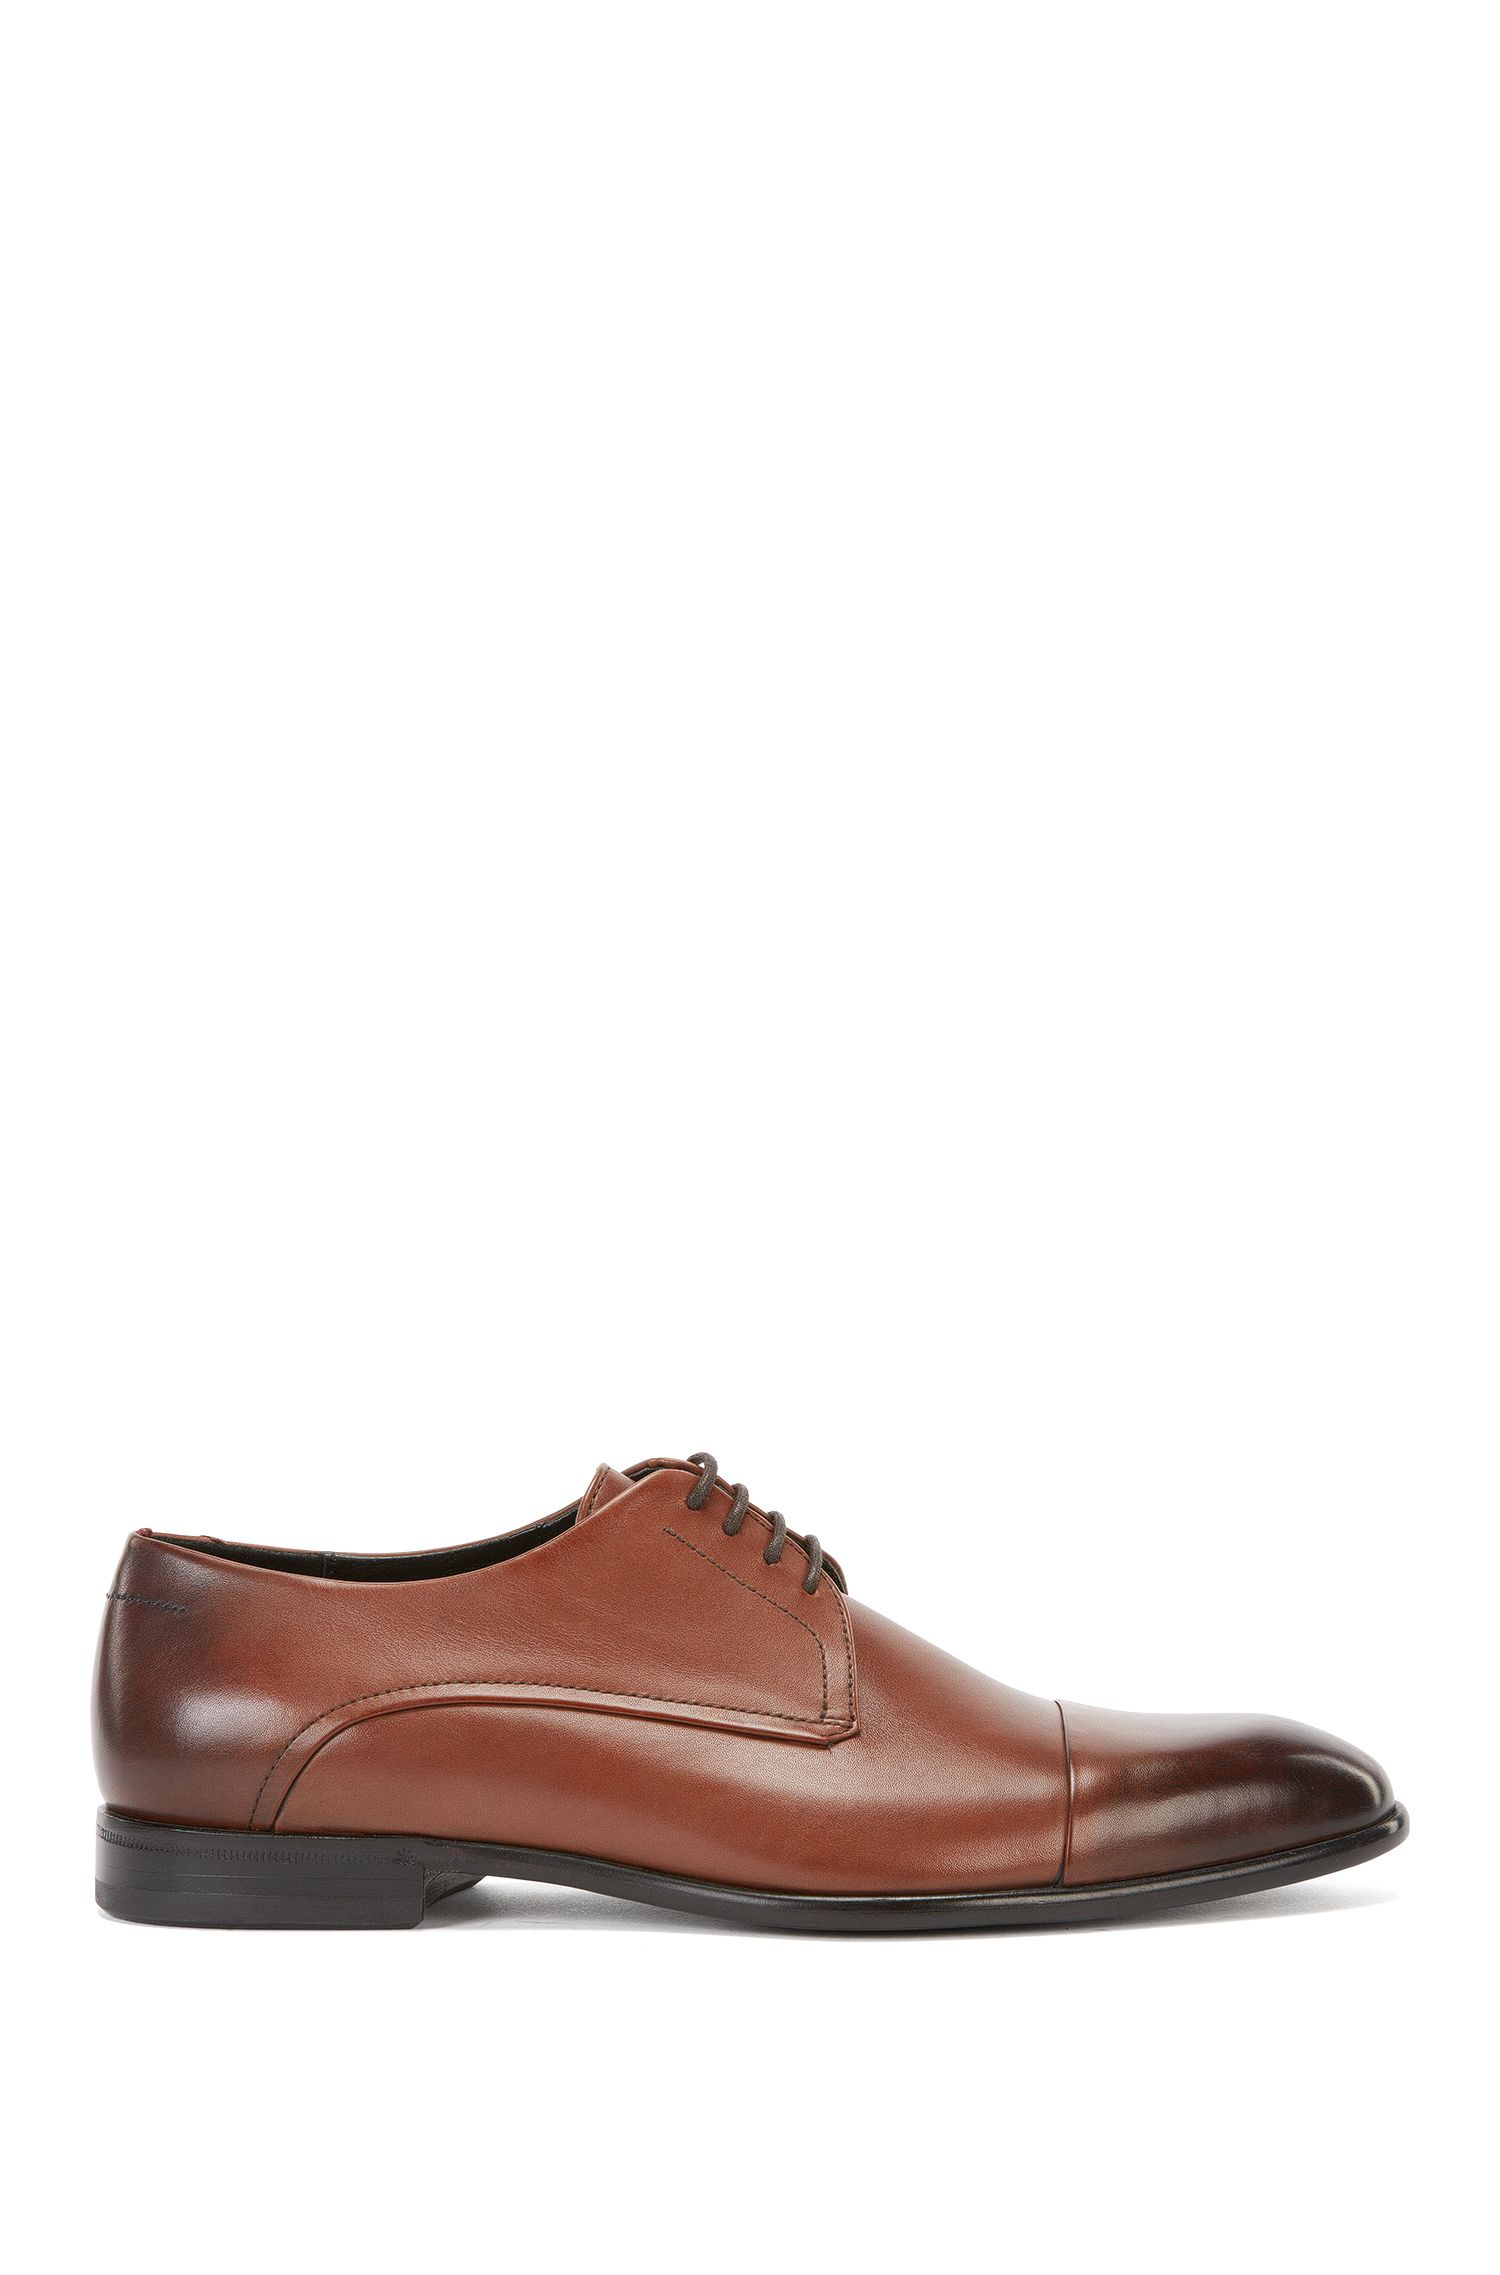 Chaussures derby en cuir poli haut de gamme